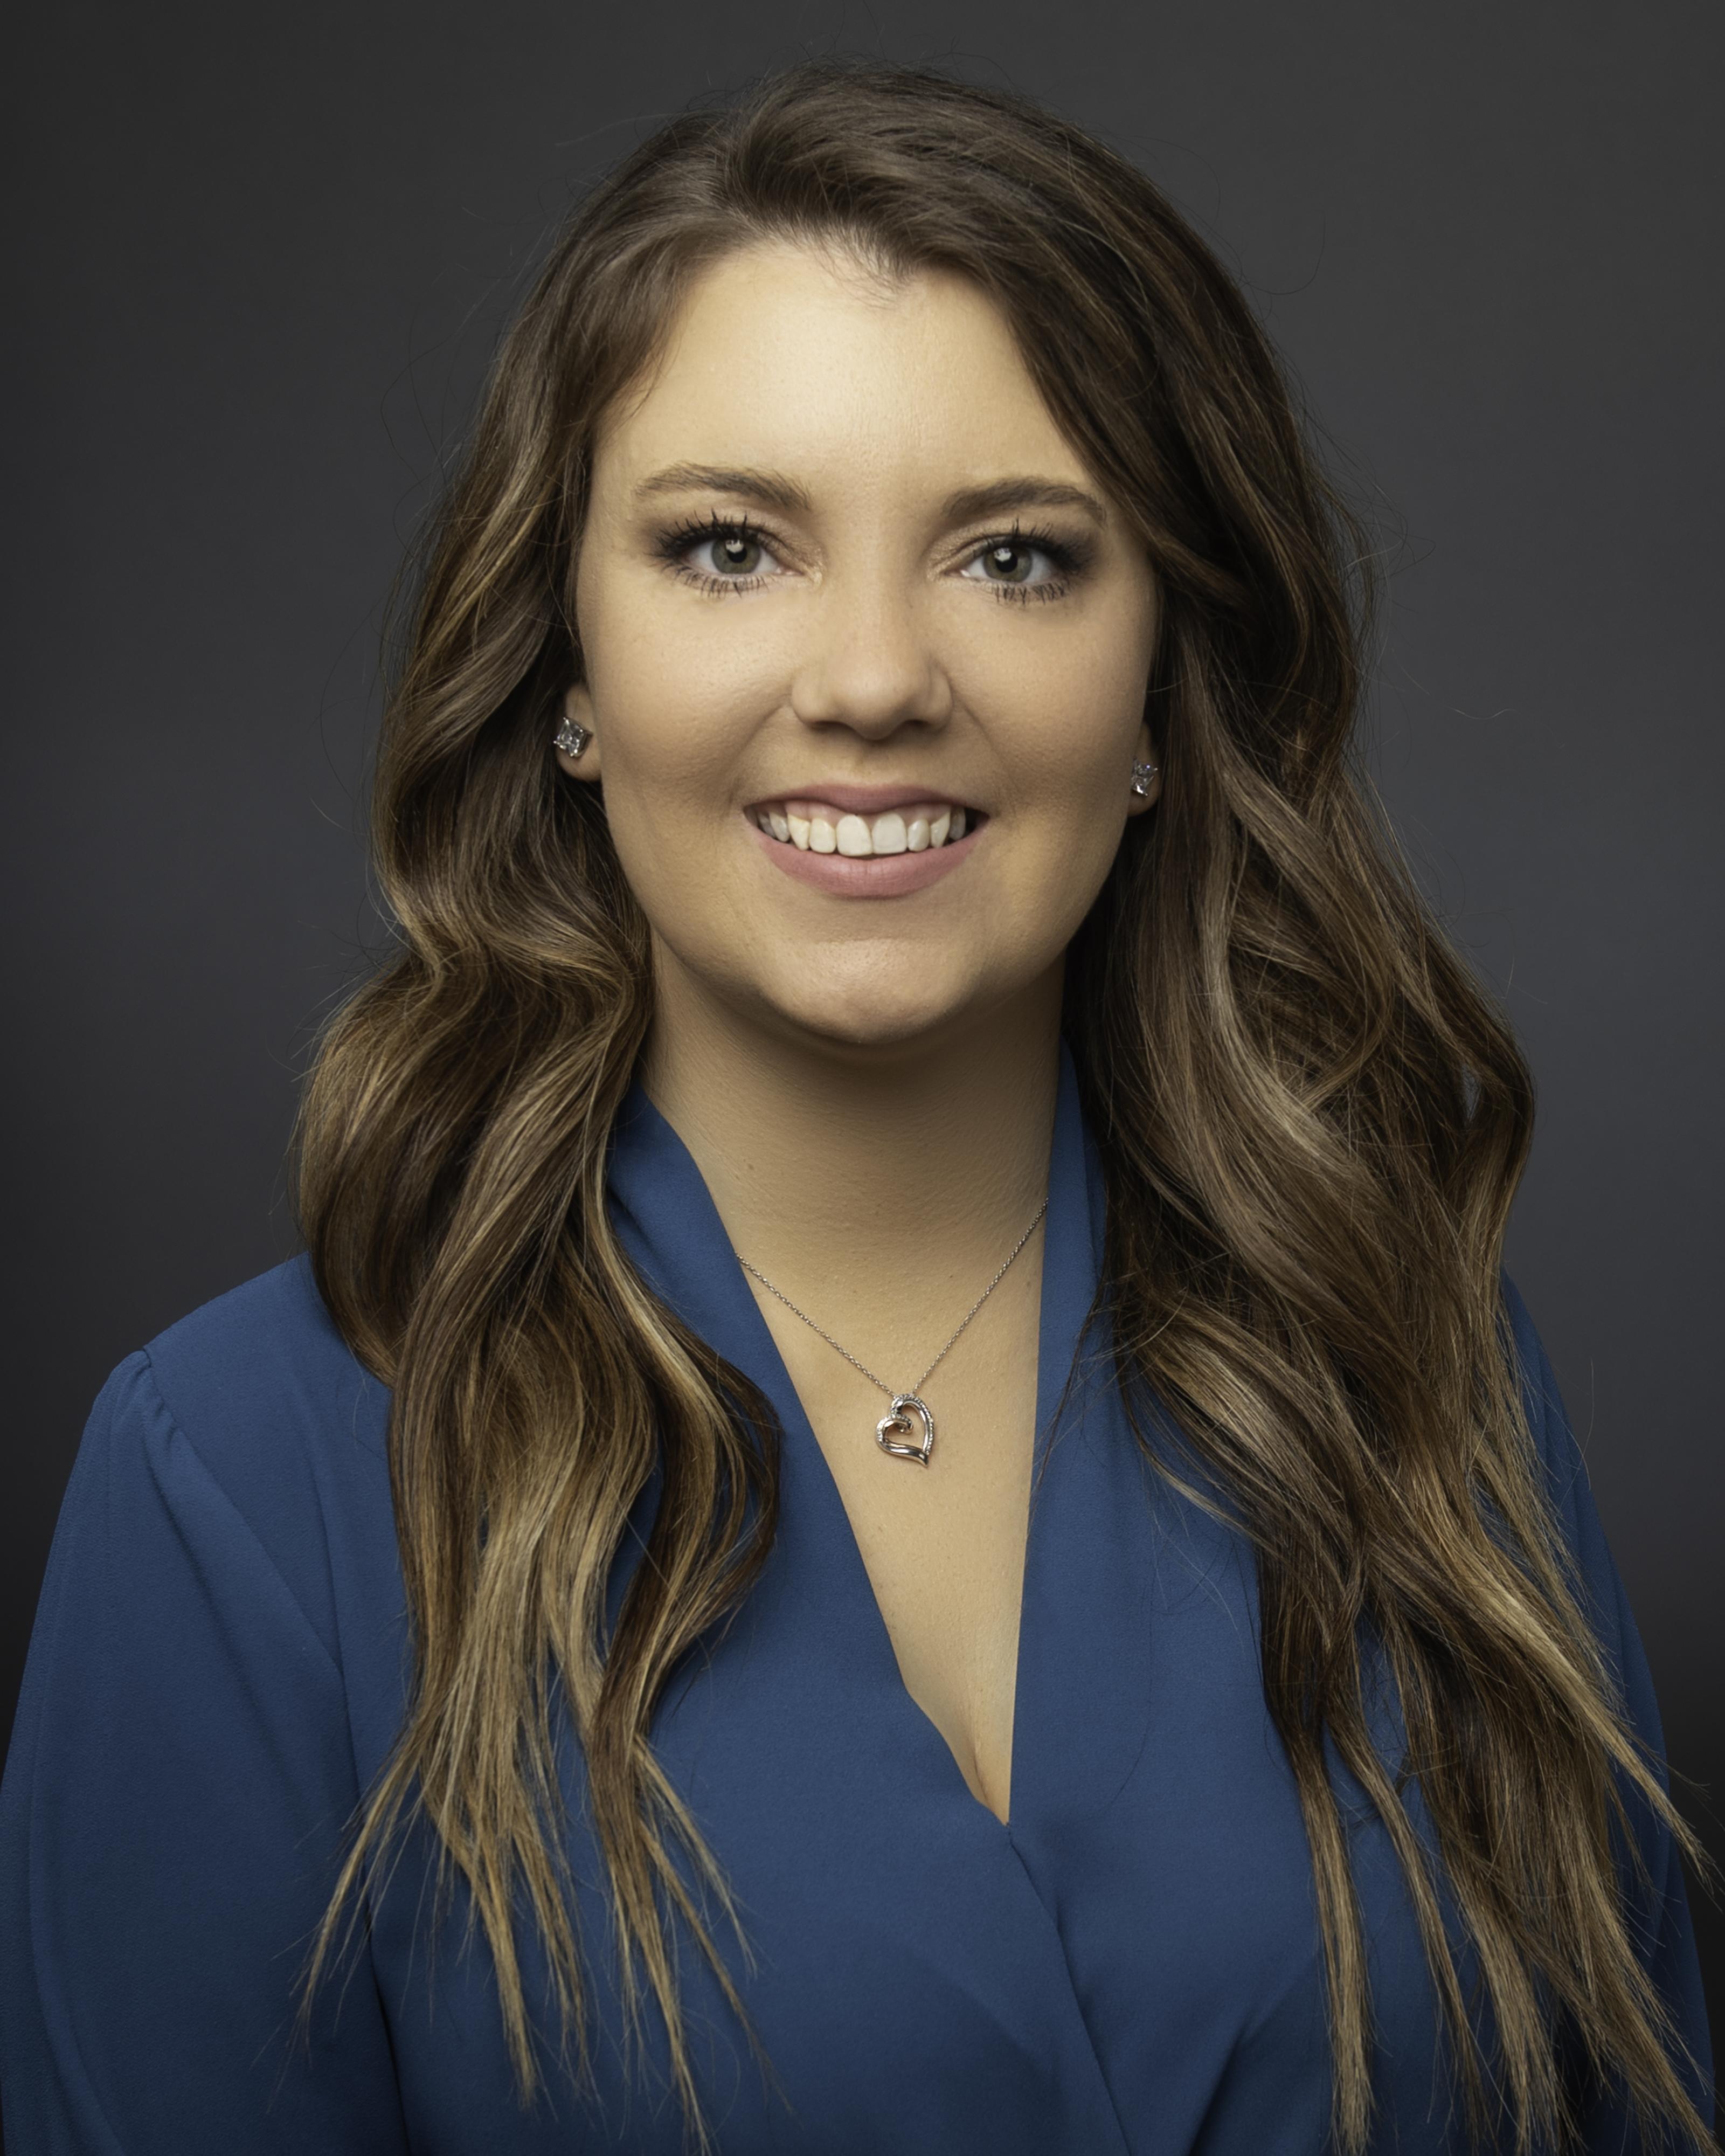 Megan undefined Hayes